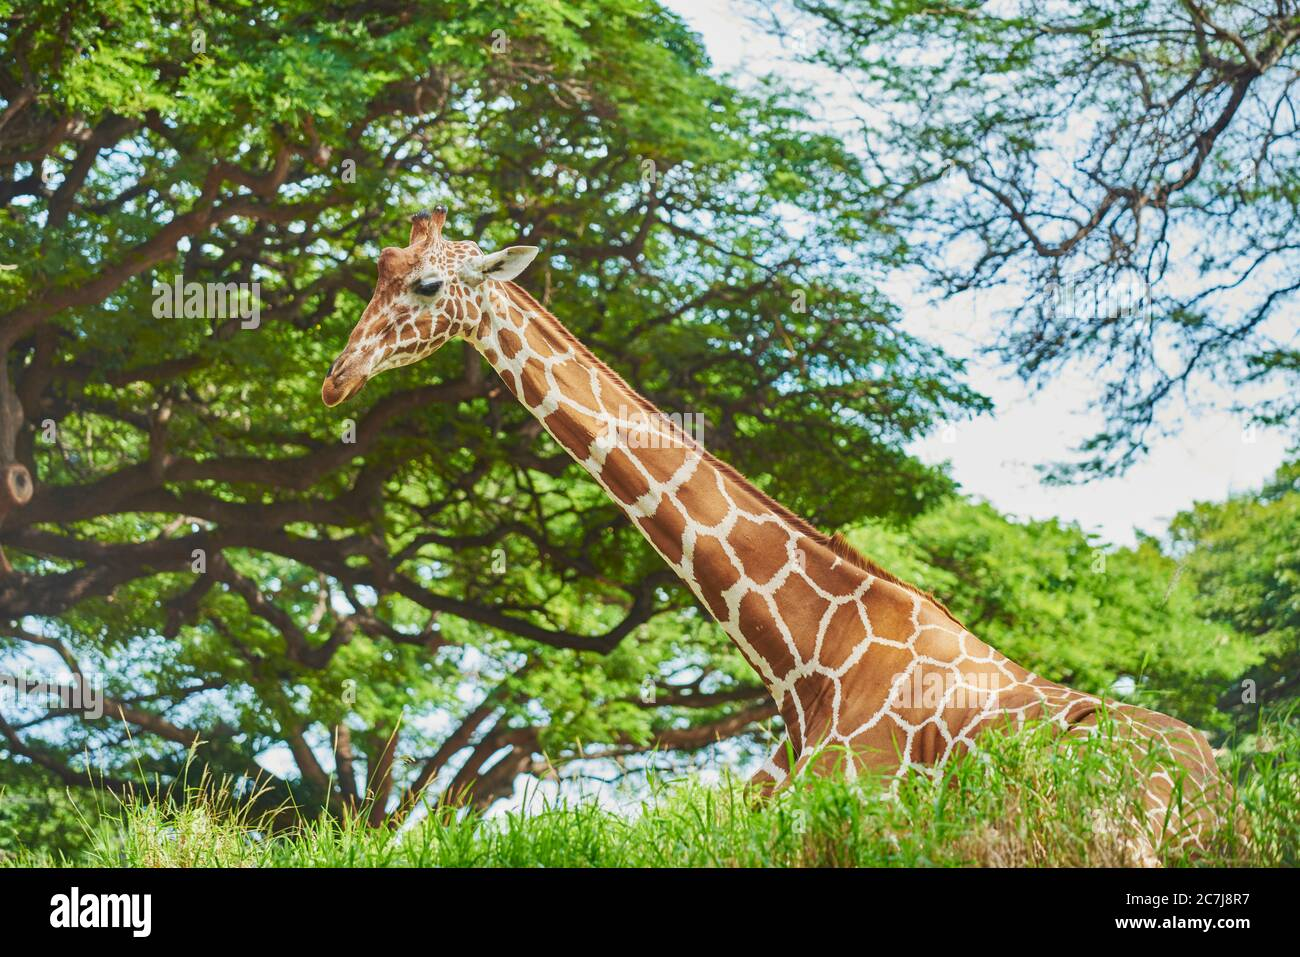 reticulated giraffe (Giraffa camelopardalis reticulata), resting on the ground in the savannah, half-length portrait, Africa Stock Photo